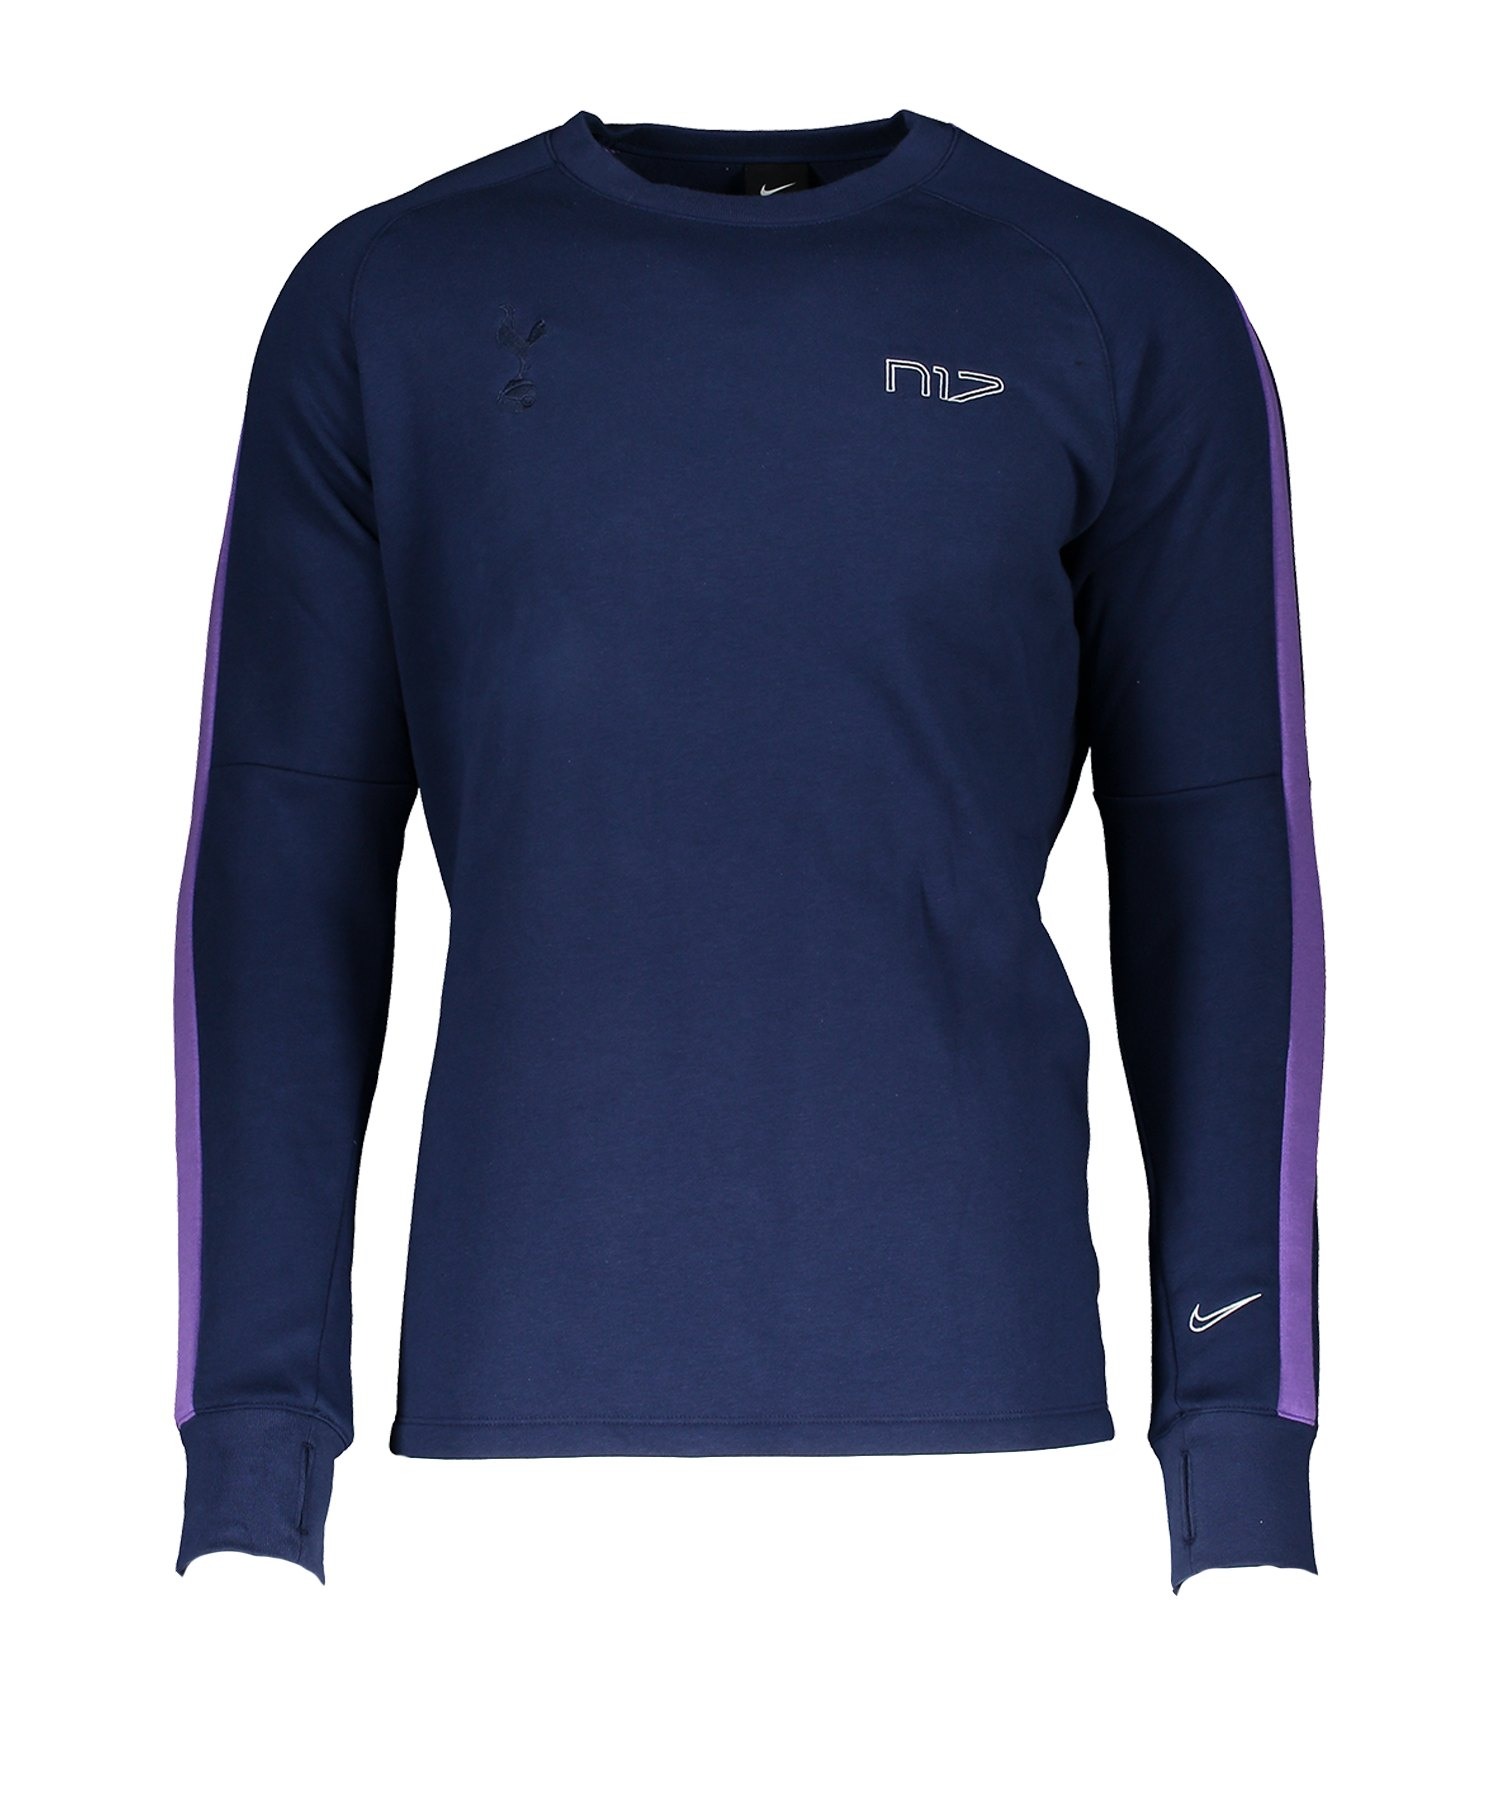 Nike Tottenham Hotspur Fleece Crew Sweatshirt F429 - lila